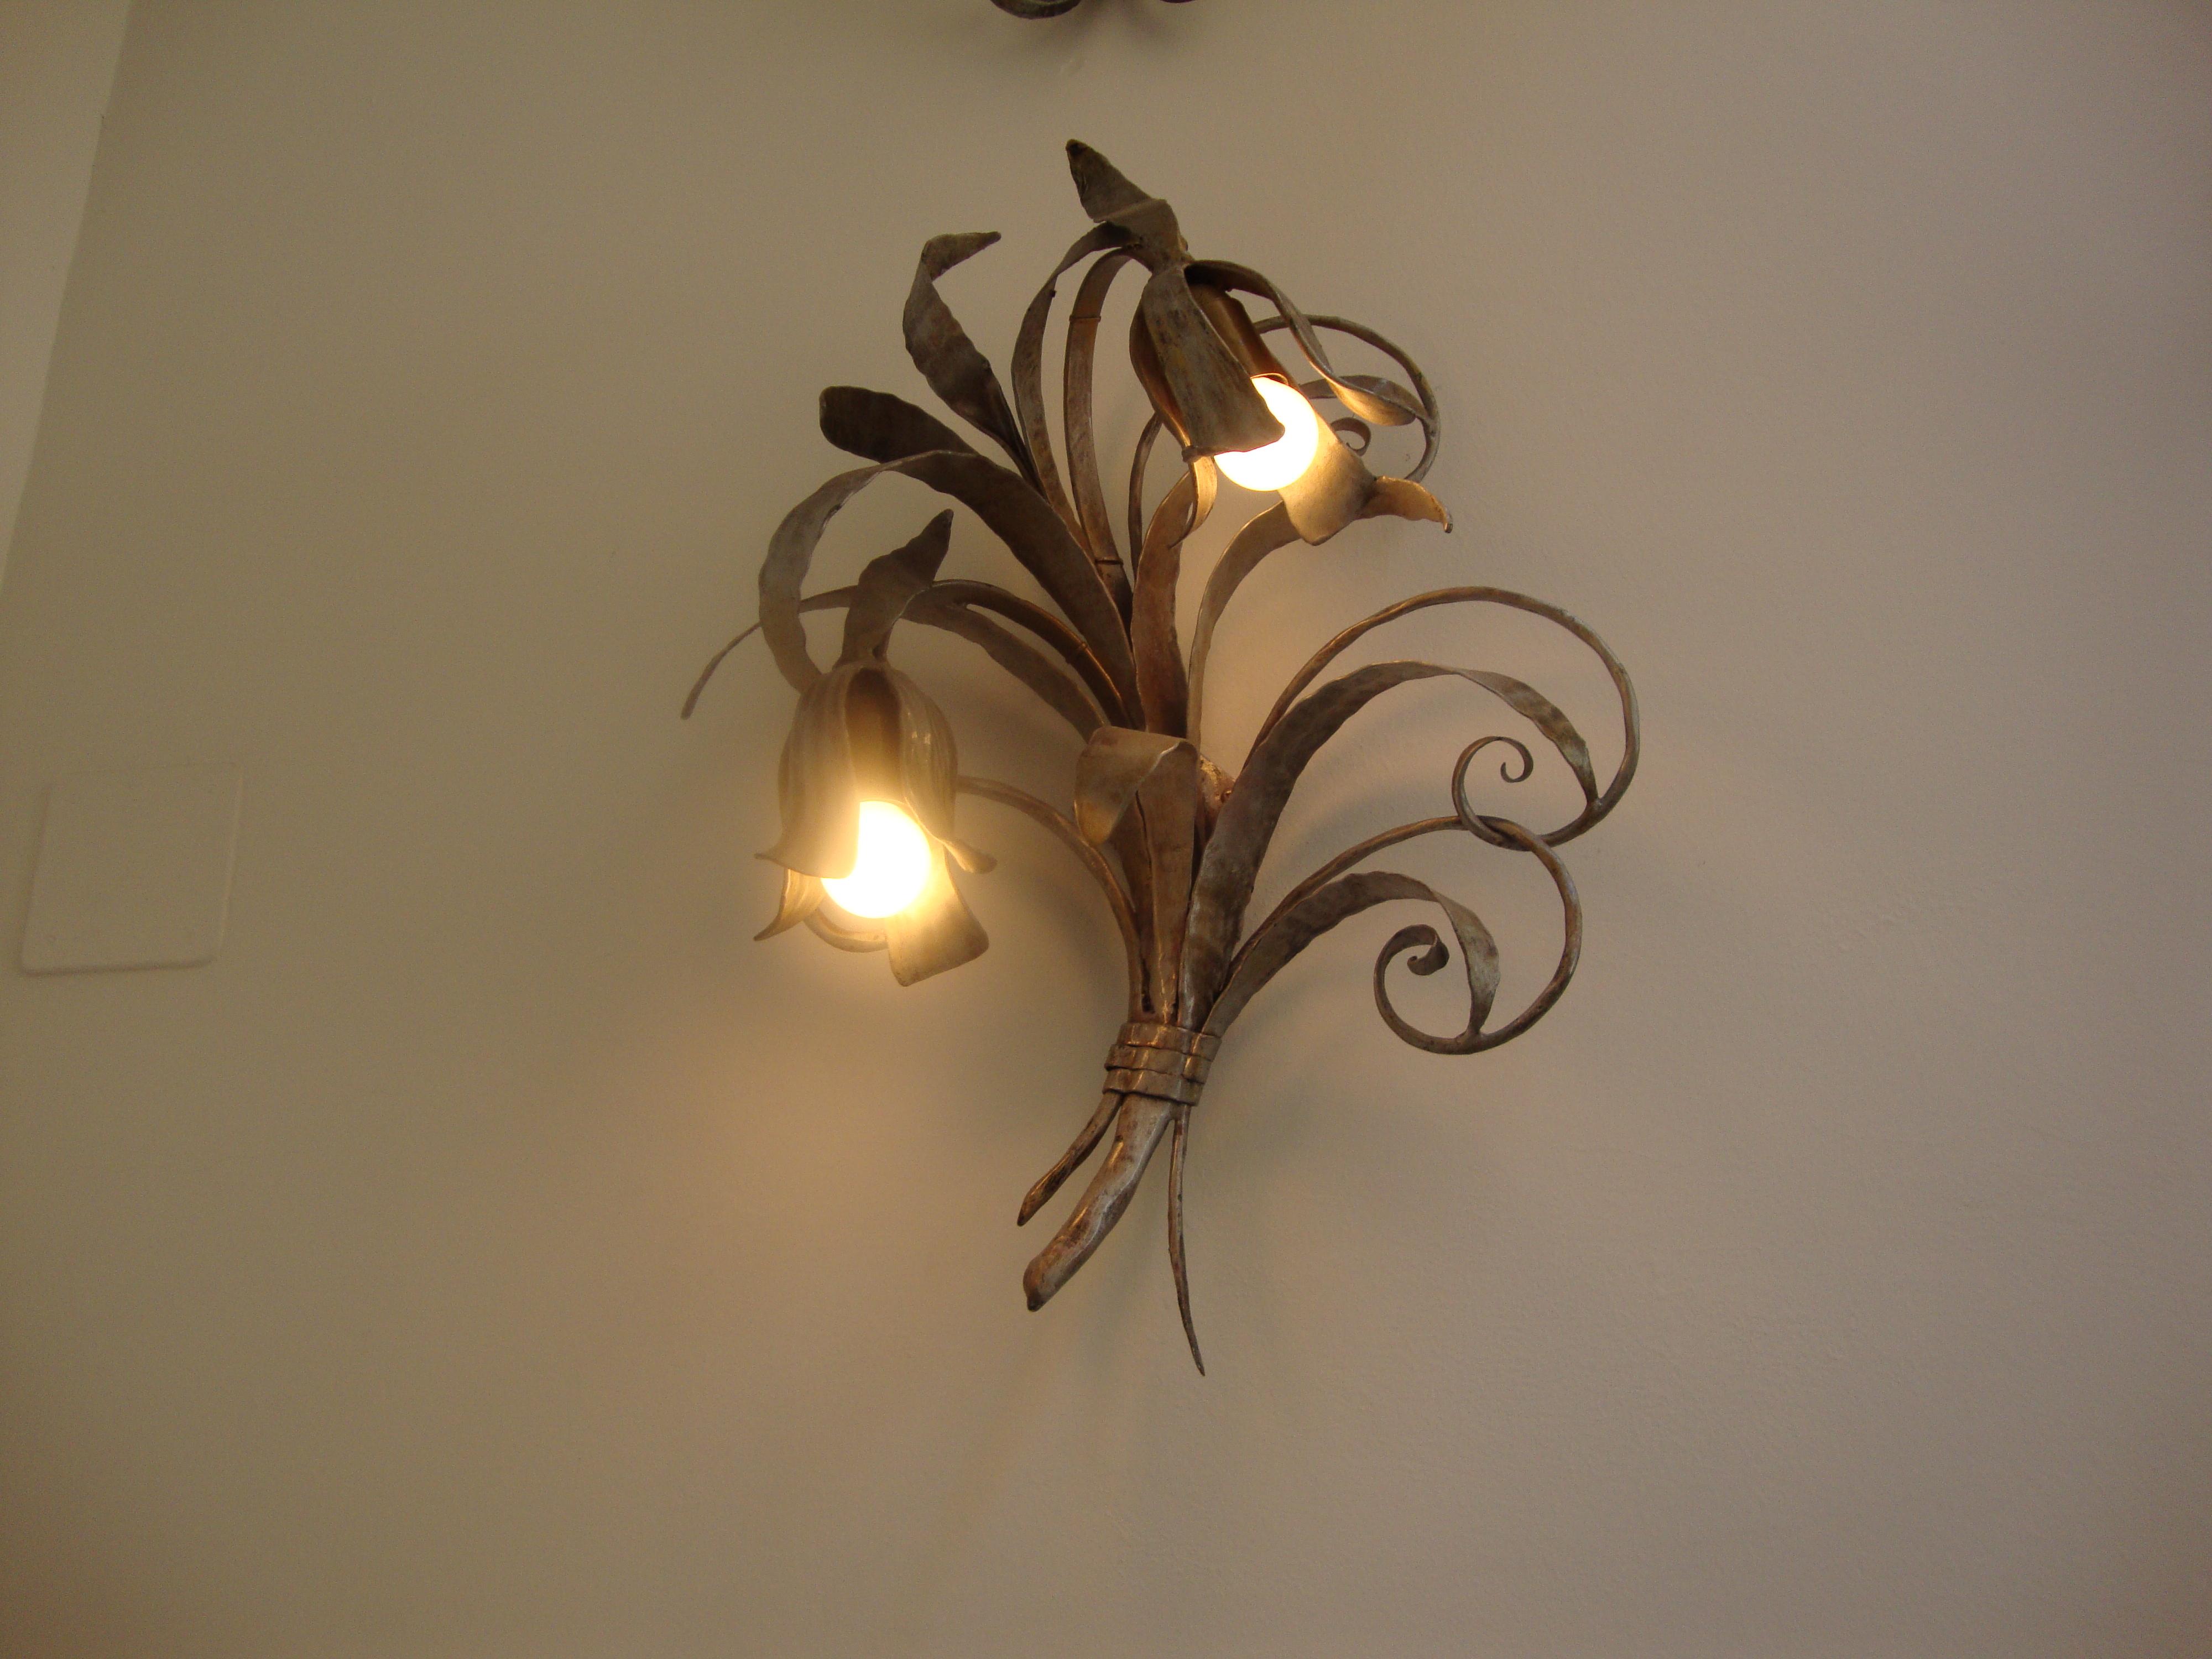 living room wall light fixtures photo - 4